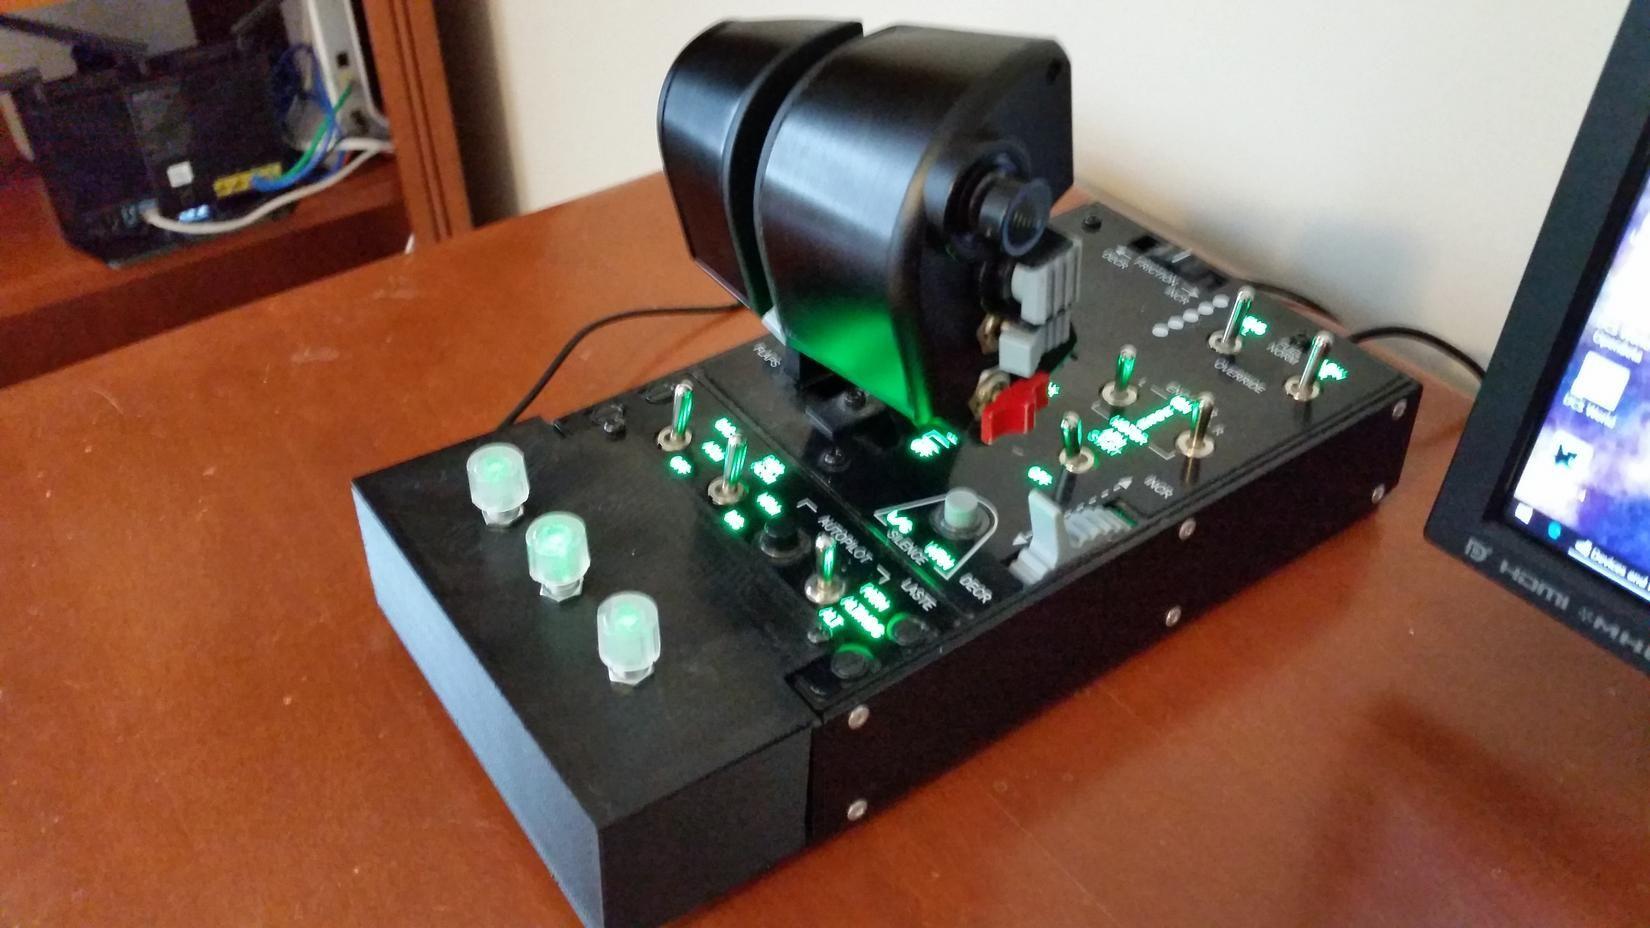 mmjoymmjoy2 build your own Flight simulator, Electronics